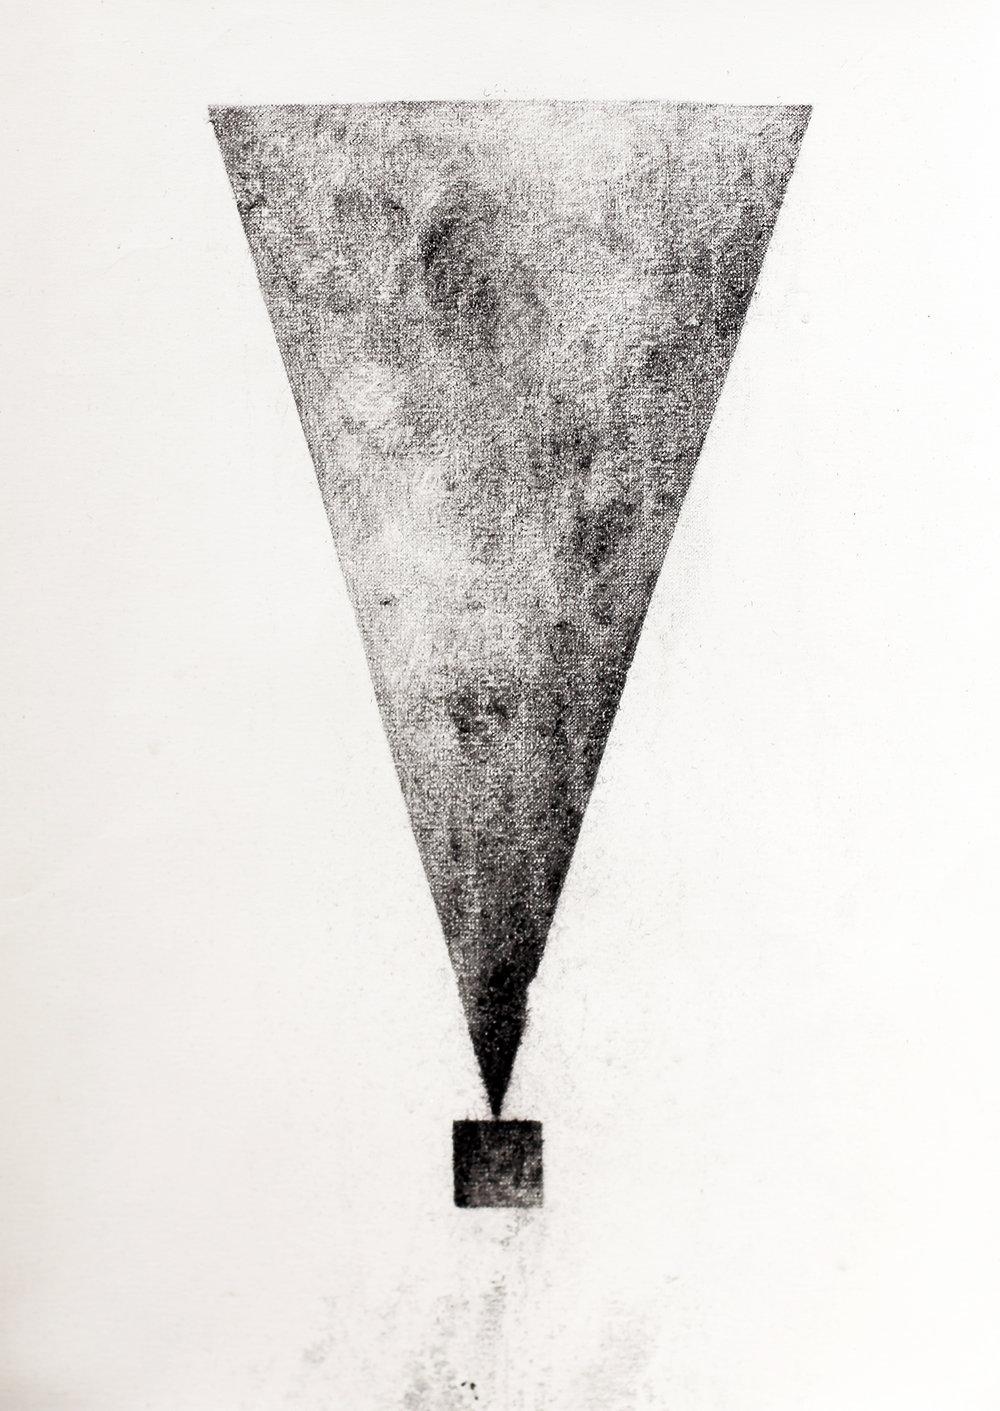 Triangle square / 세모 네모    Charcoal on terra paper, 40x25cm, 2018